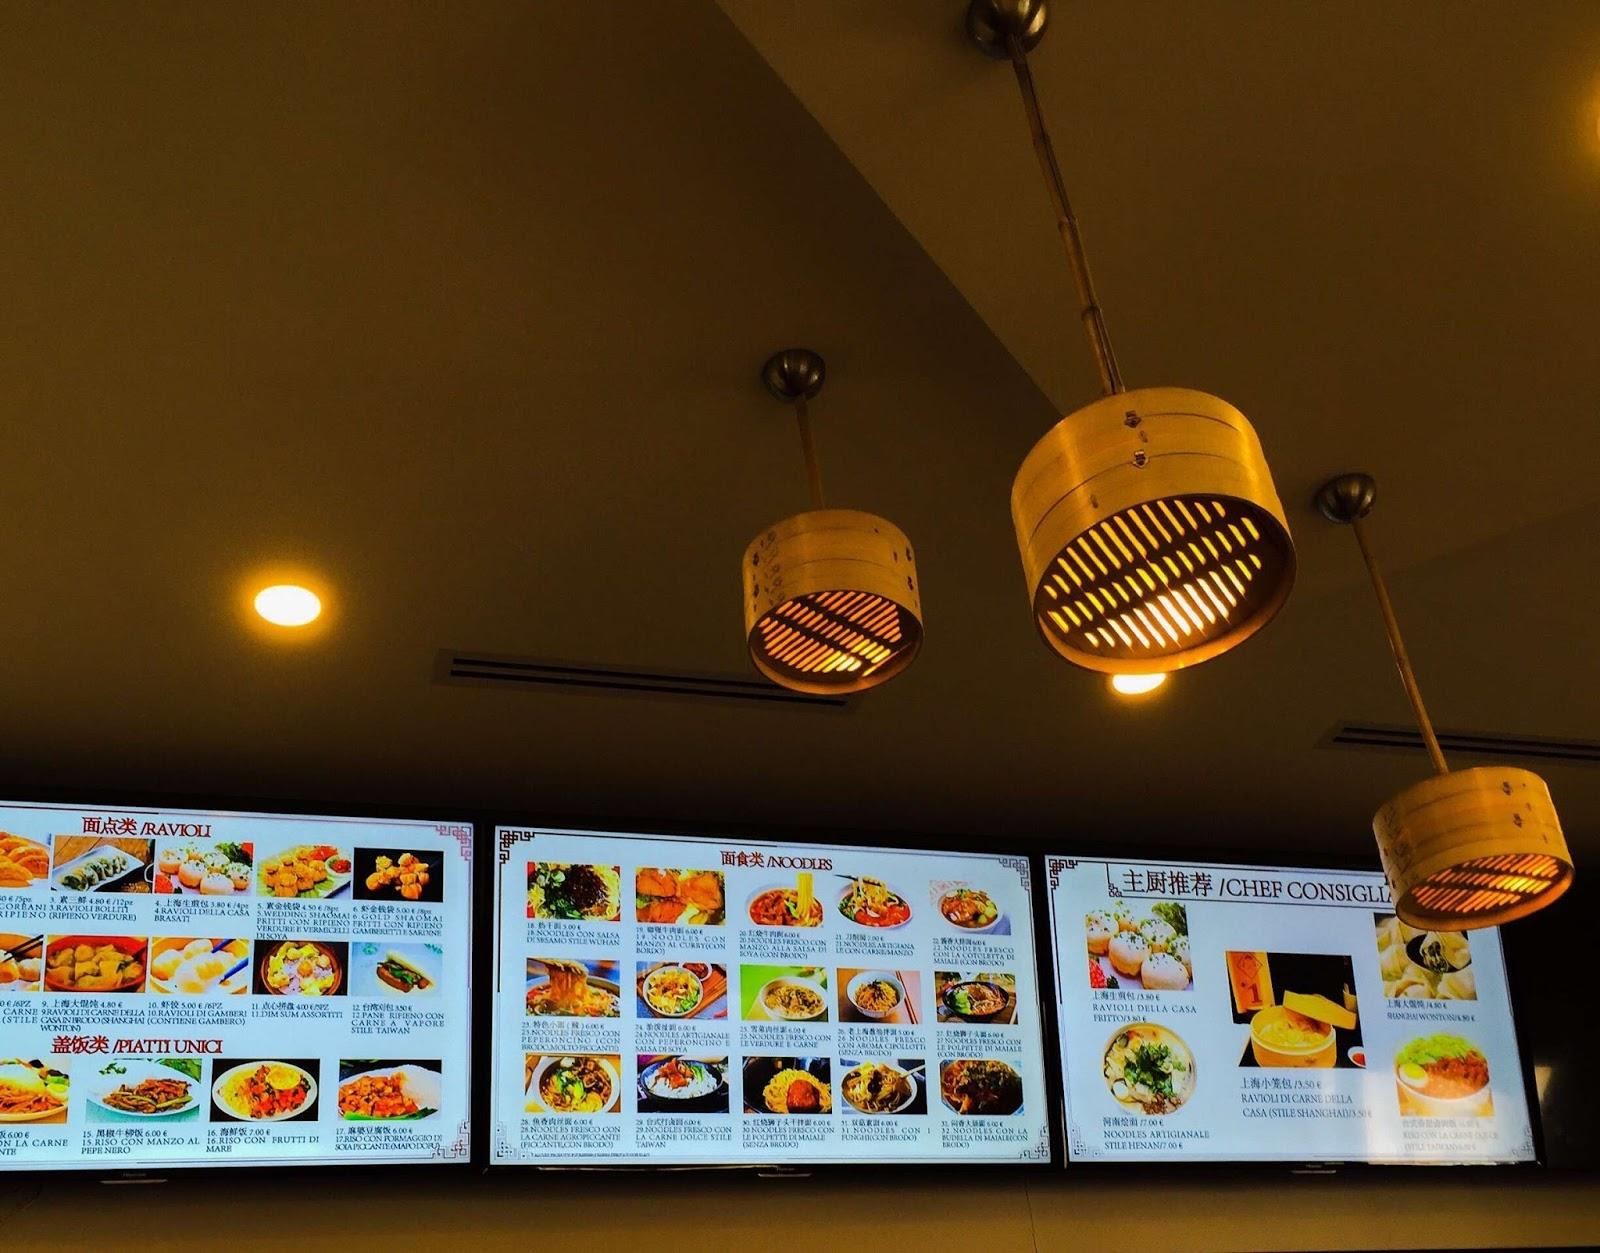 tang-gourmet-milano